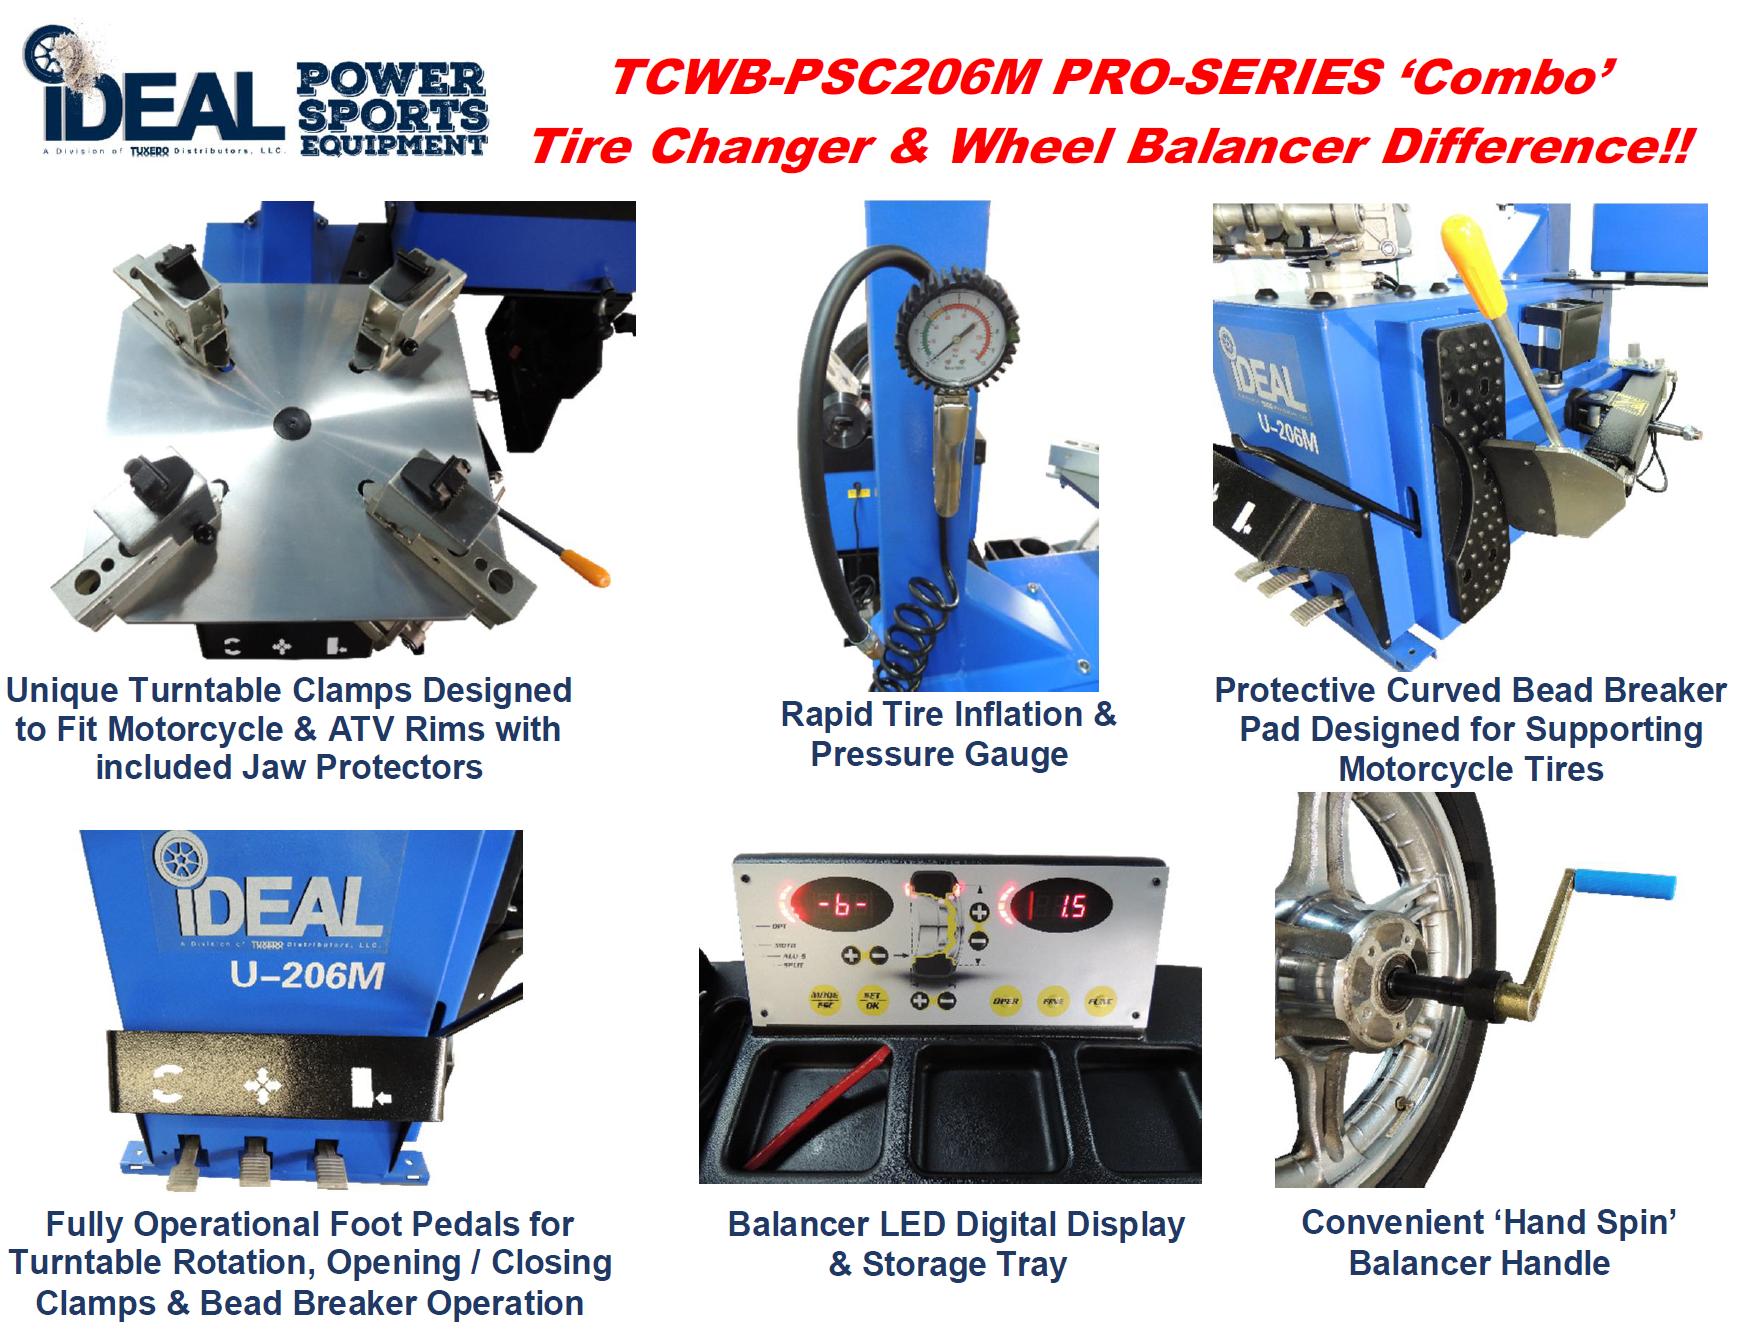 ideal-tcwb-psc206m-ideal-featgures.png